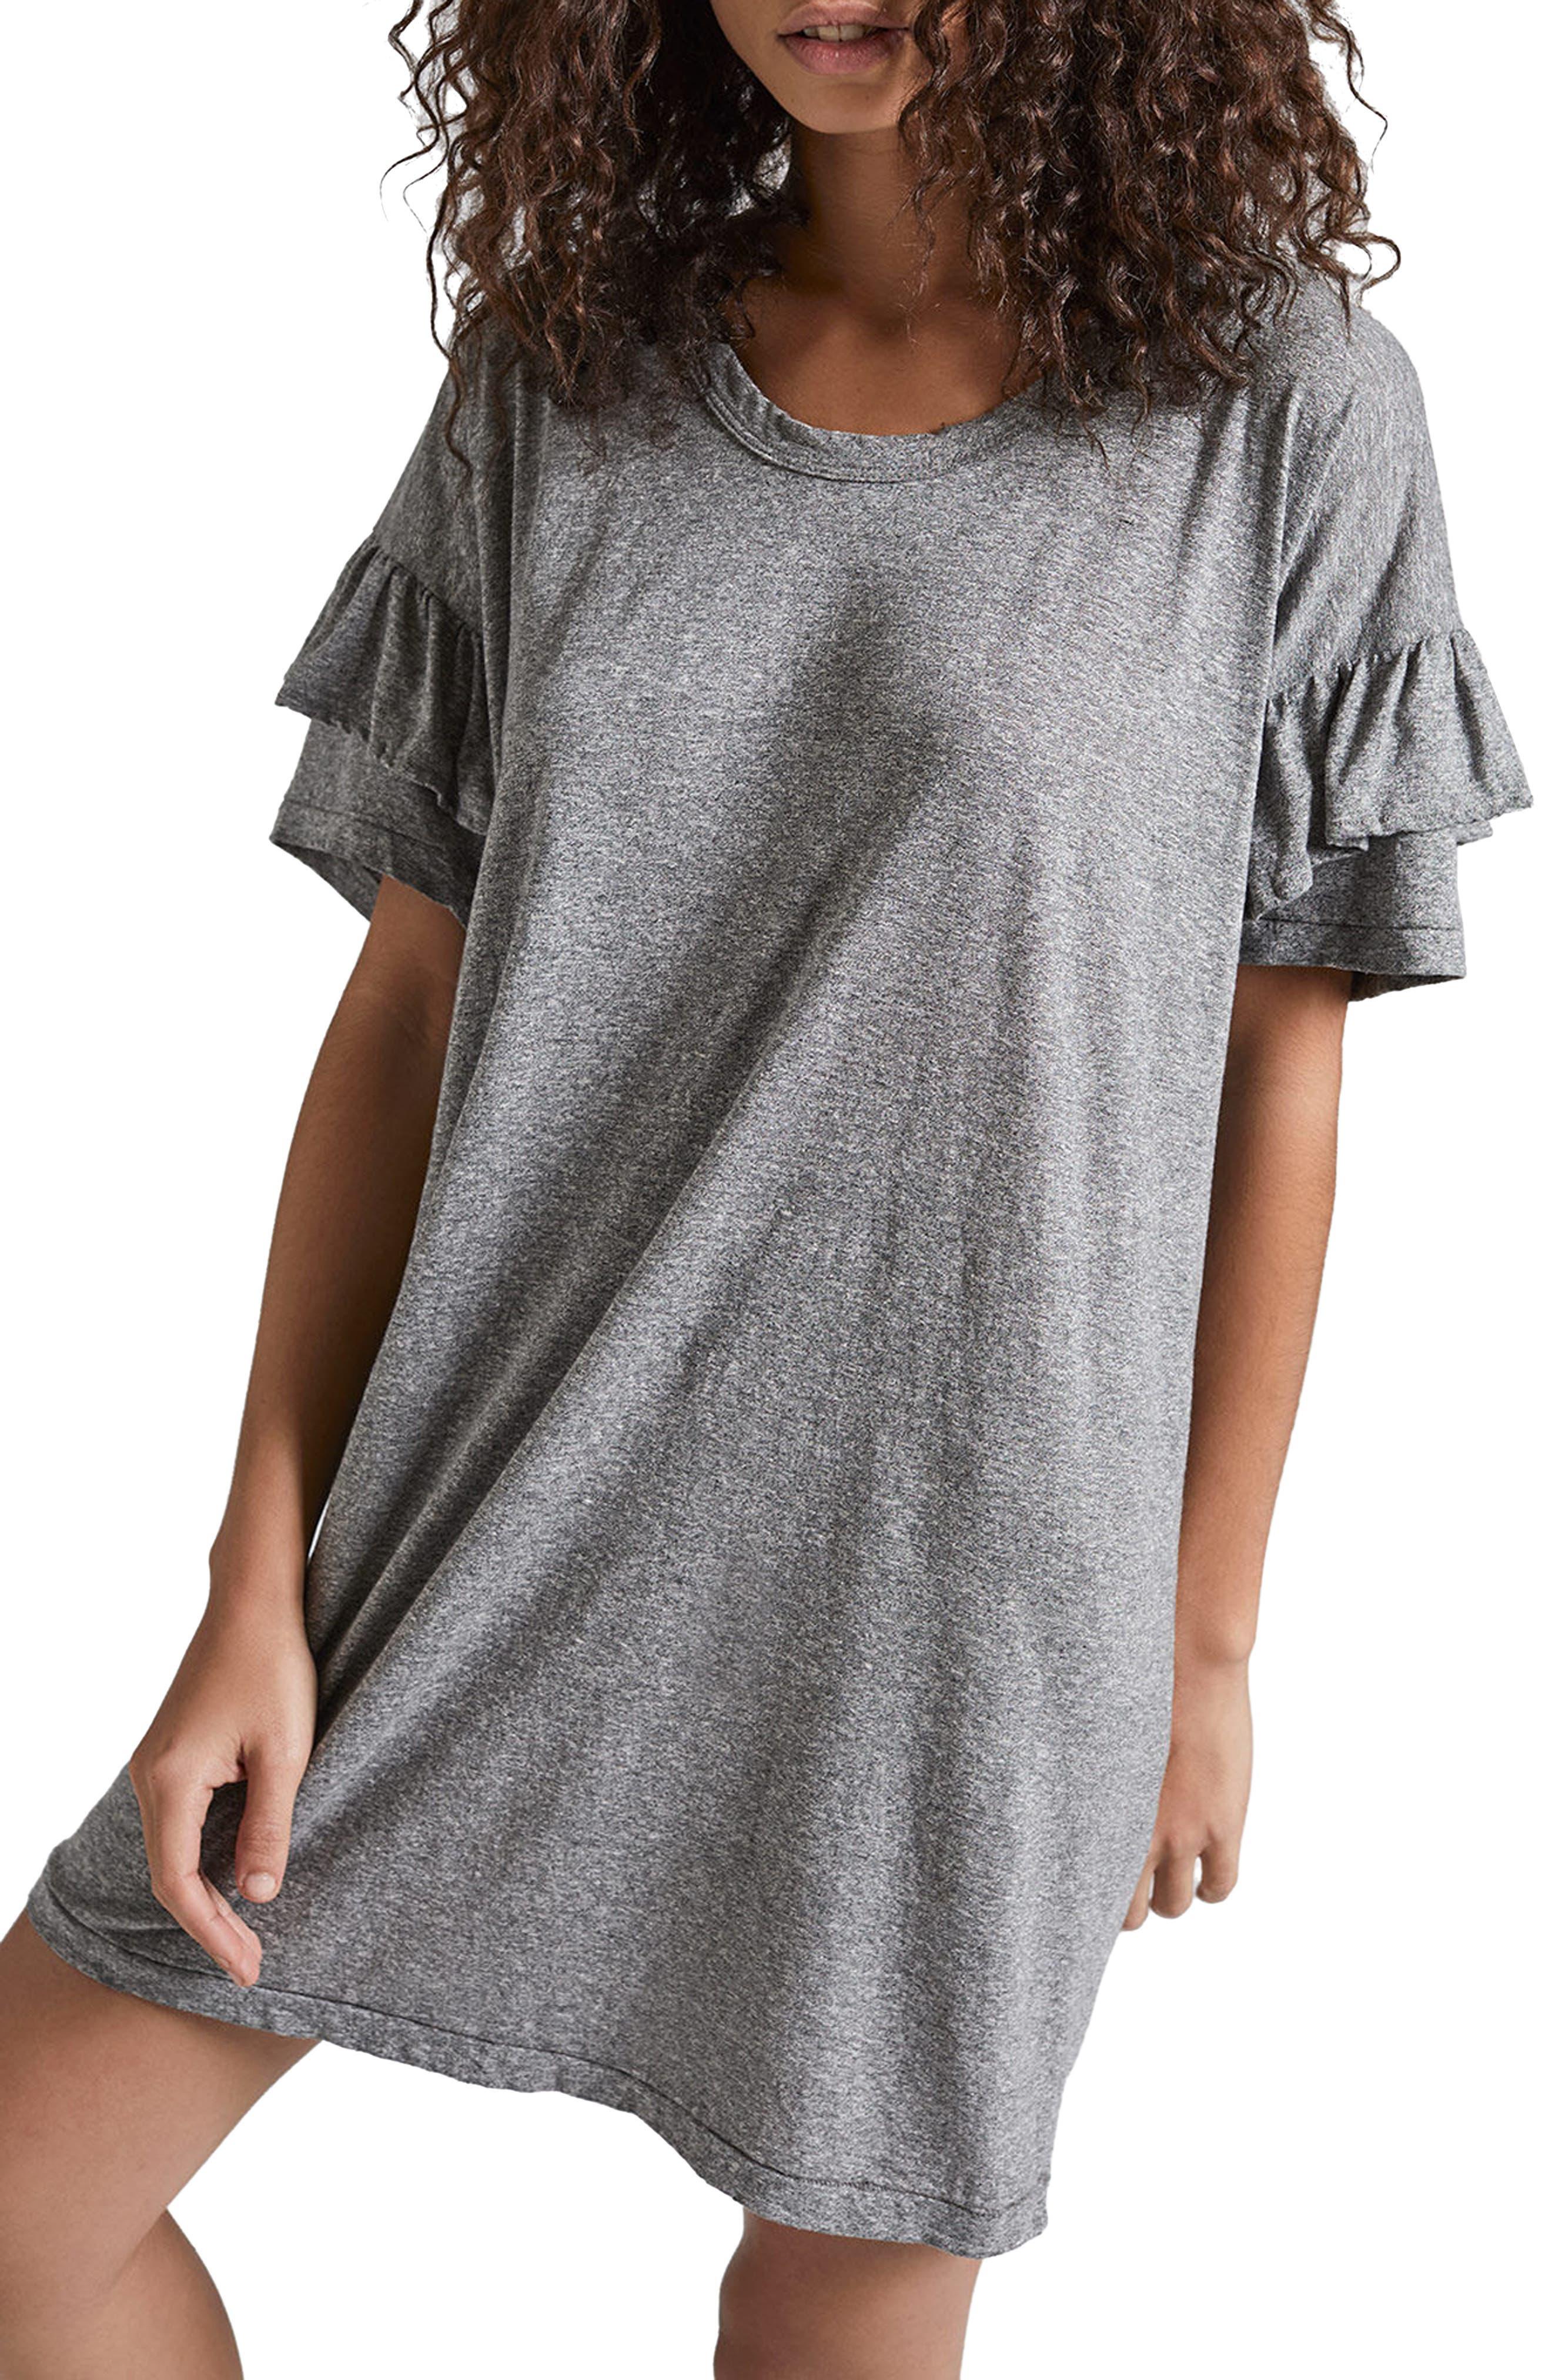 Main Image - Current/Elliott Ruffle Roadie T-Shirt Dress